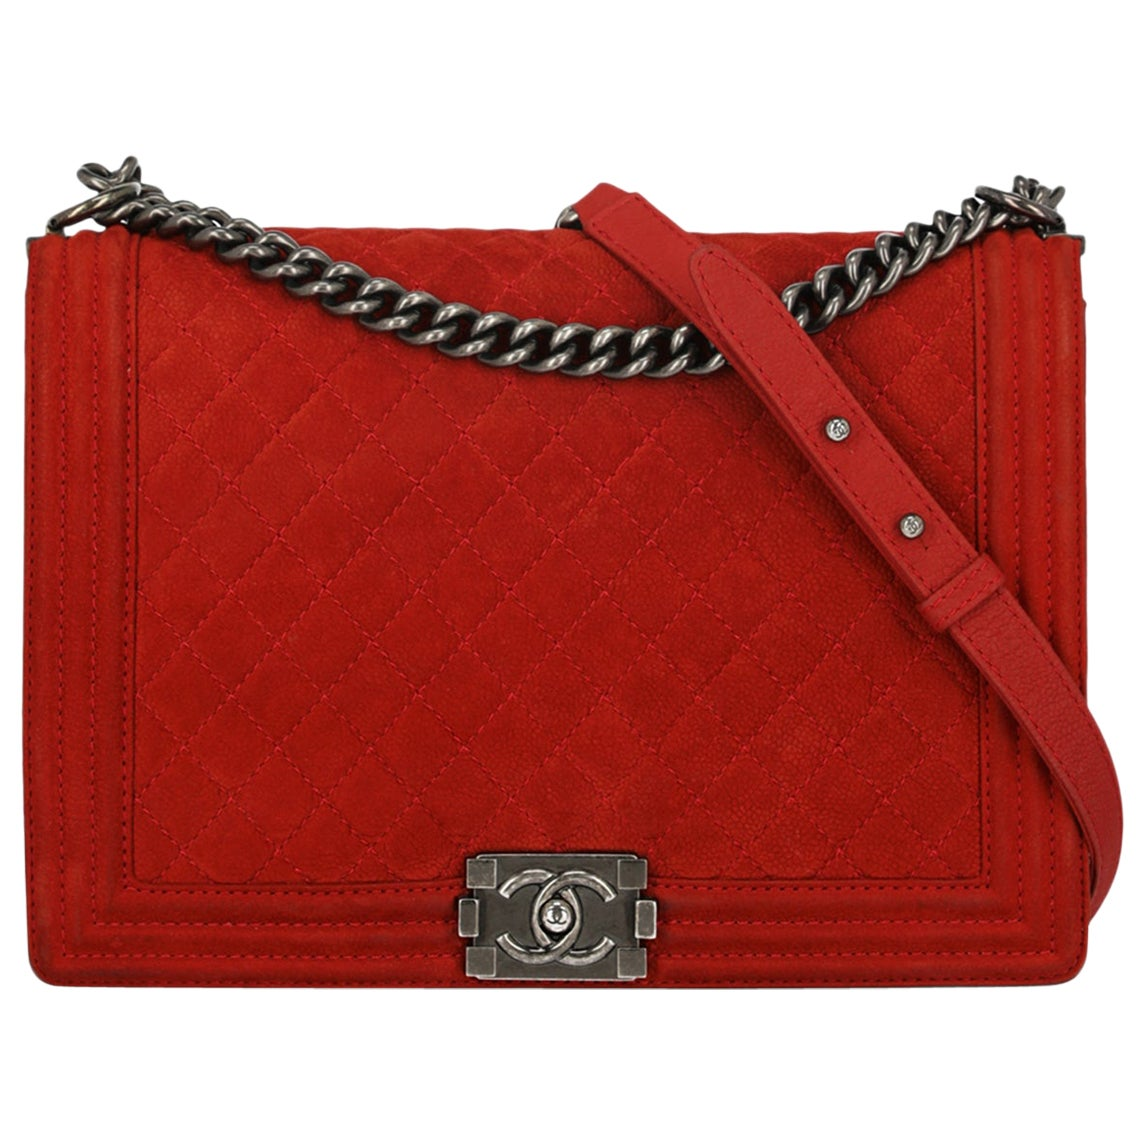 Chanel Woman Boy Red